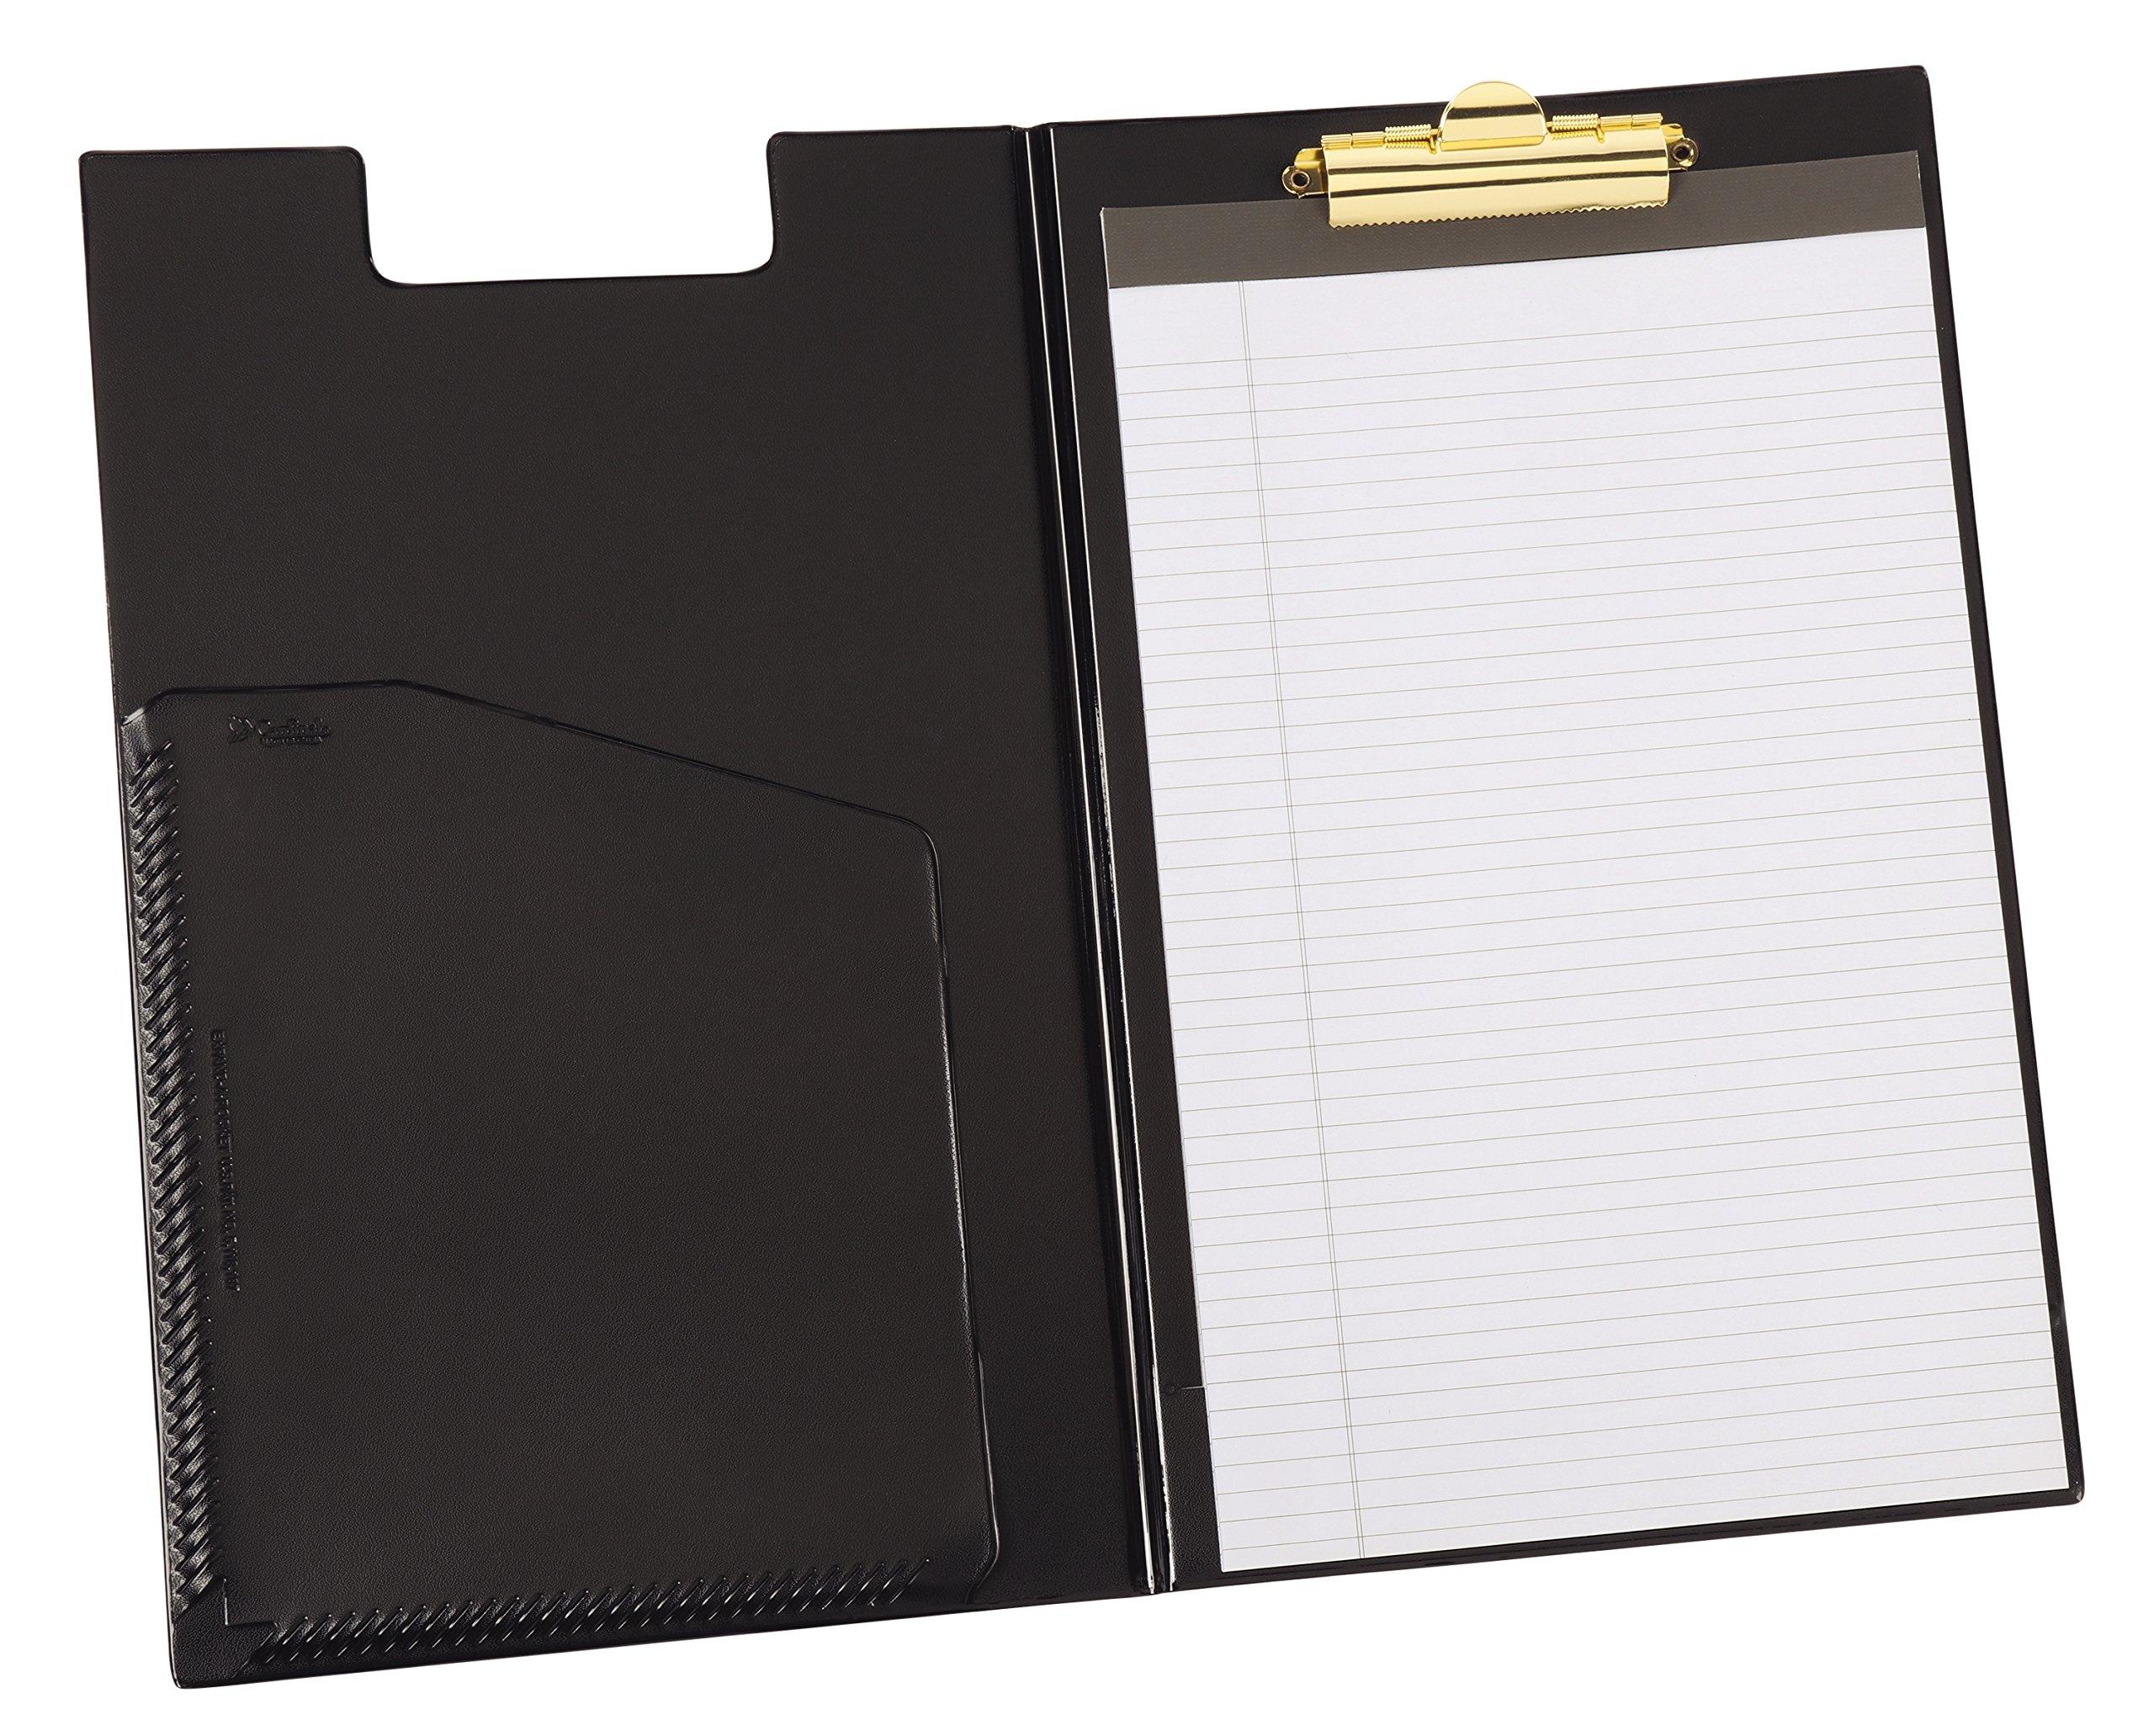 Cardinal Clip Folder Pad Holder, Legal Size, Includes Writing Pad, Black (253 610)